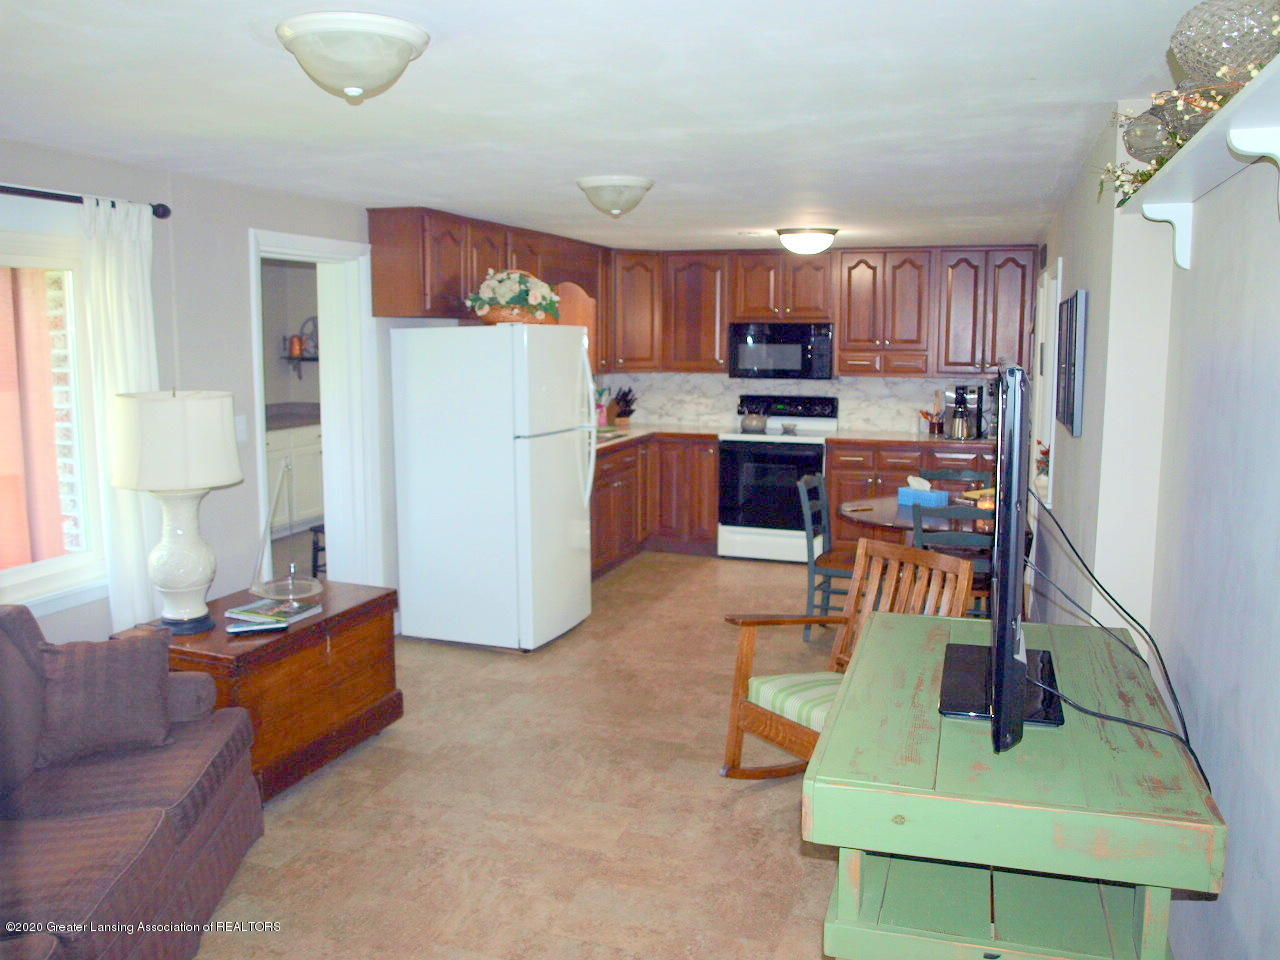 1208 S Oakland St - Family Room/Kitchen - 6